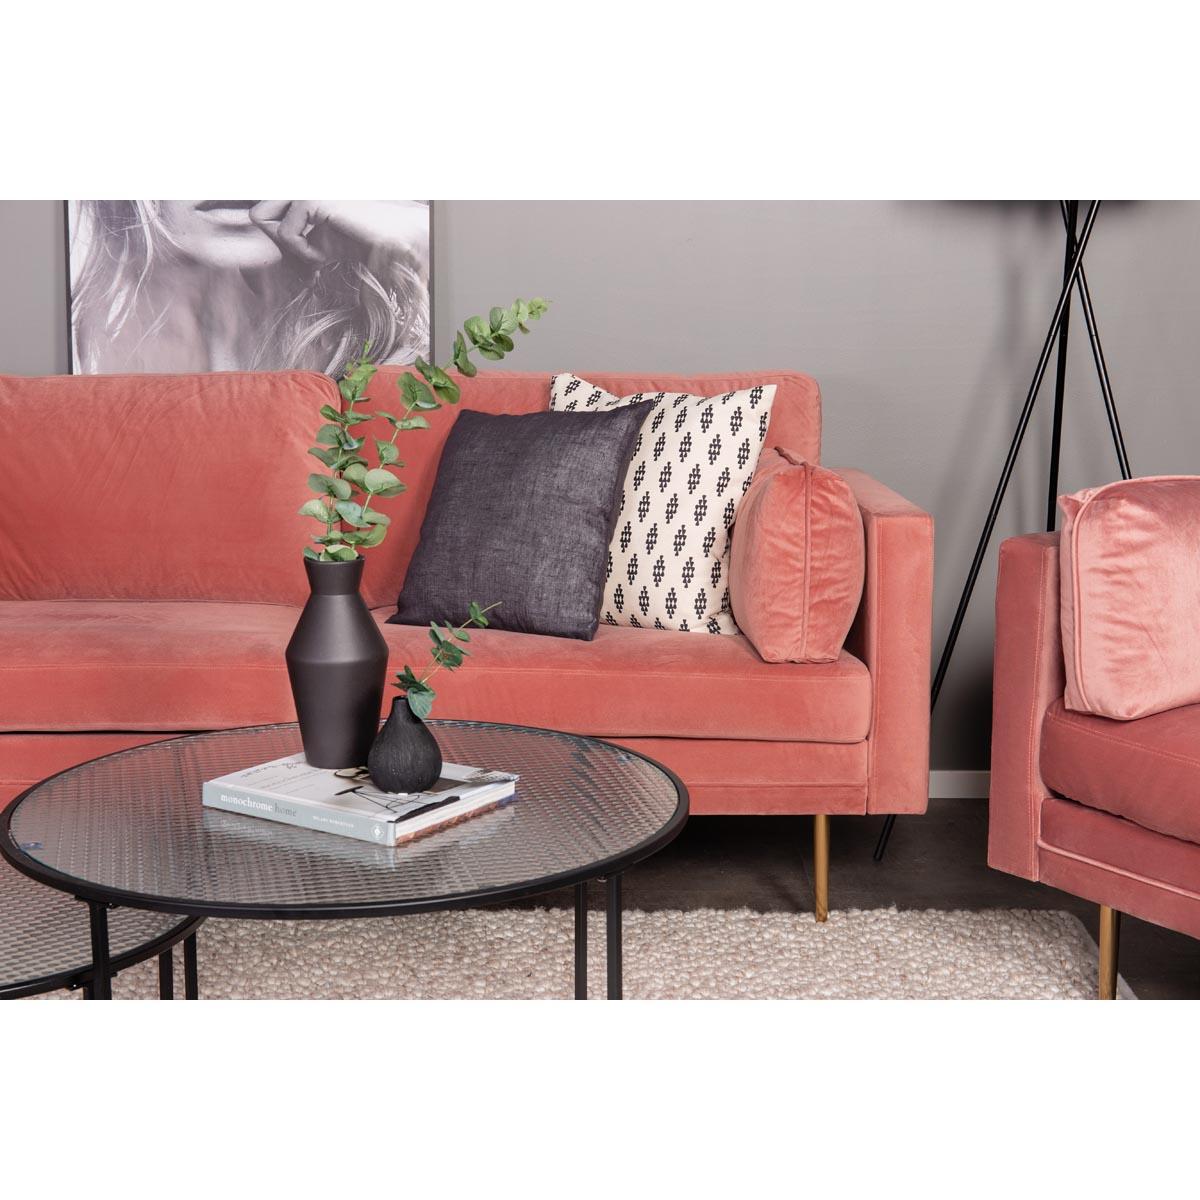 Boom-3-sits-soffa-rosa-sammet-miljo-detalj-18045-989